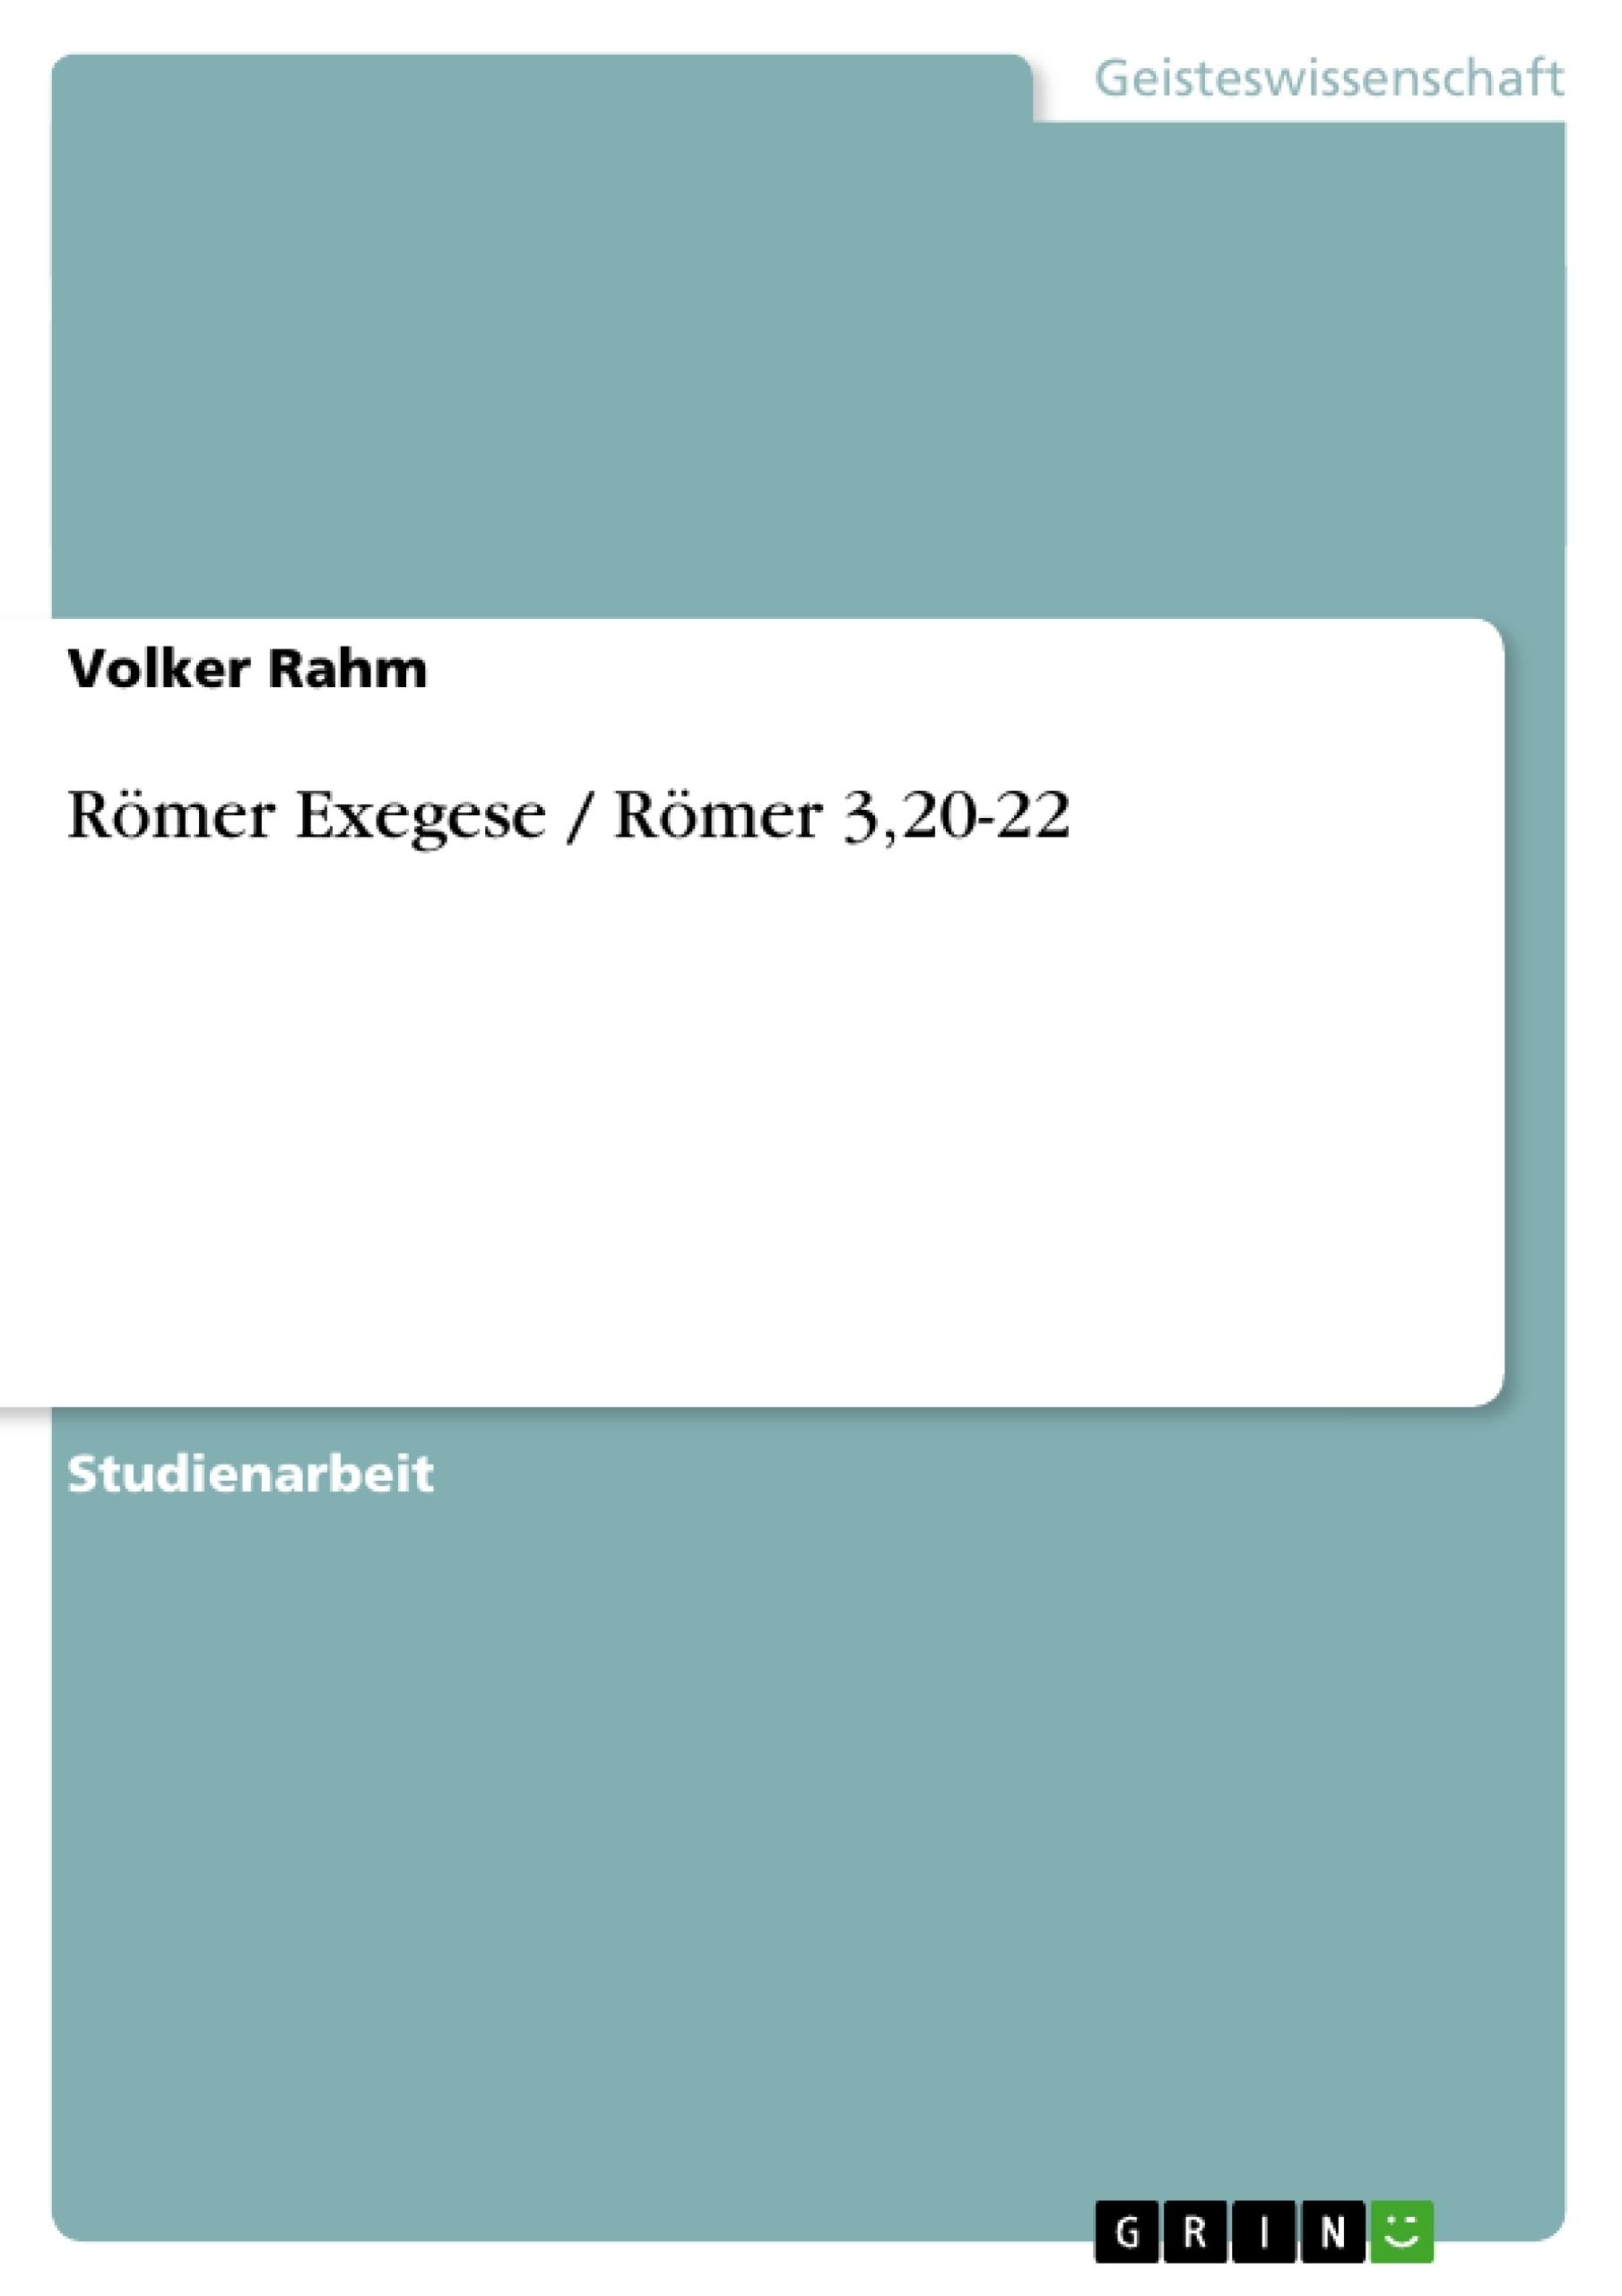 Titel: Römer Exegese / Römer 3,20-22